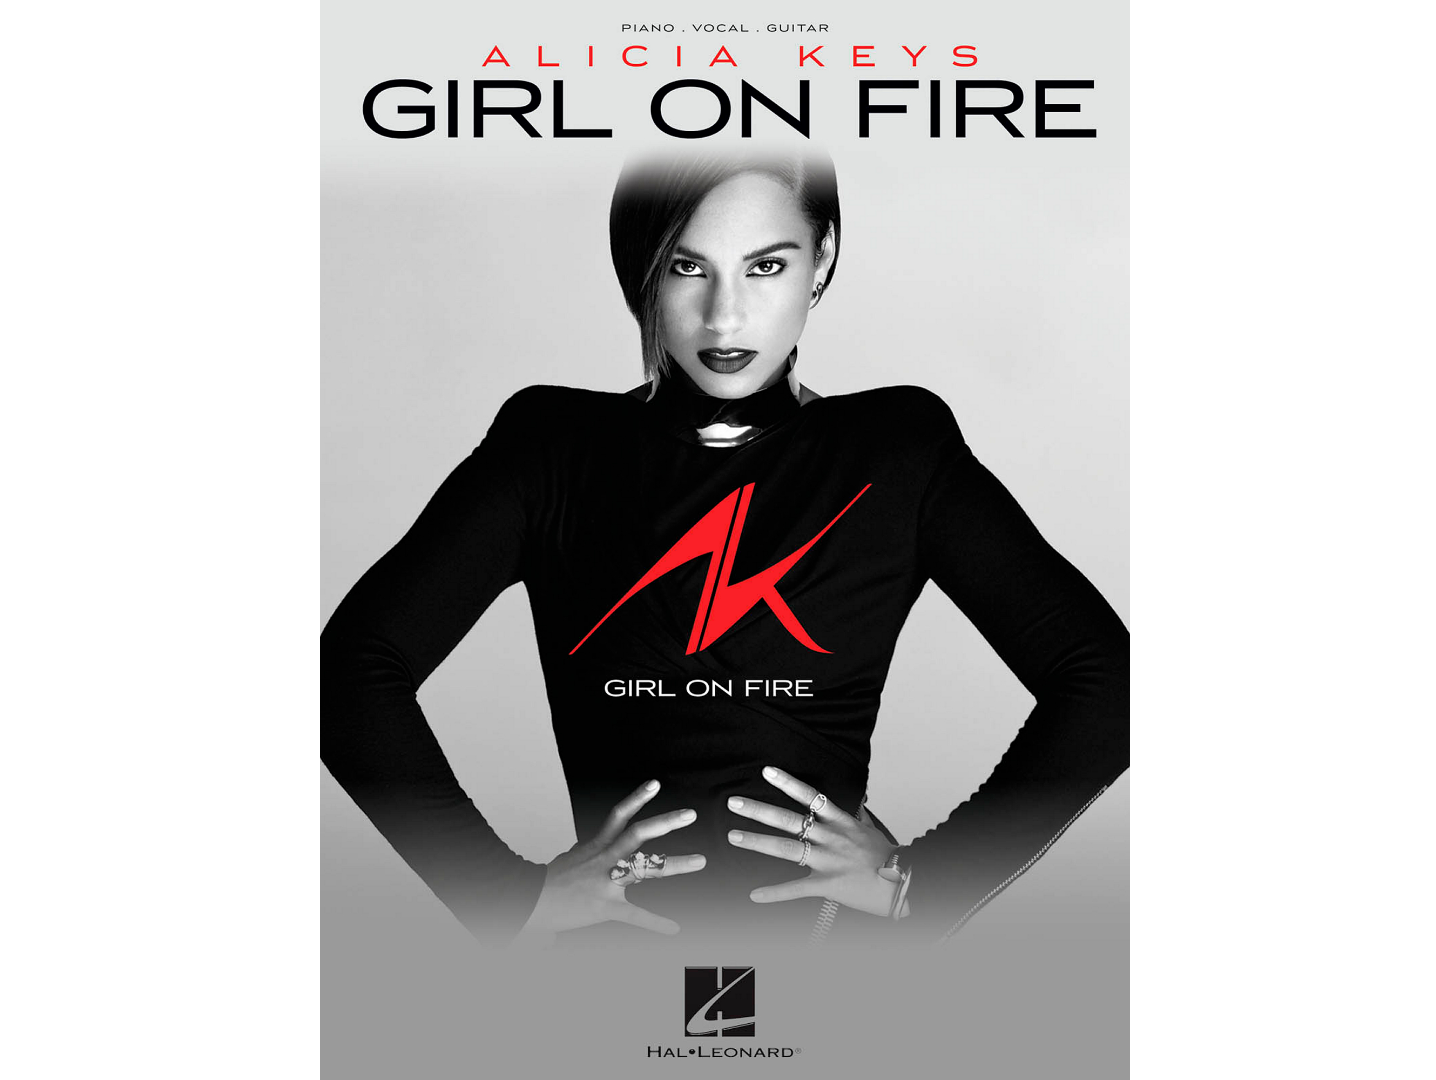 Alicia Keys Girl on Fire Piano/Vocal/Guitar